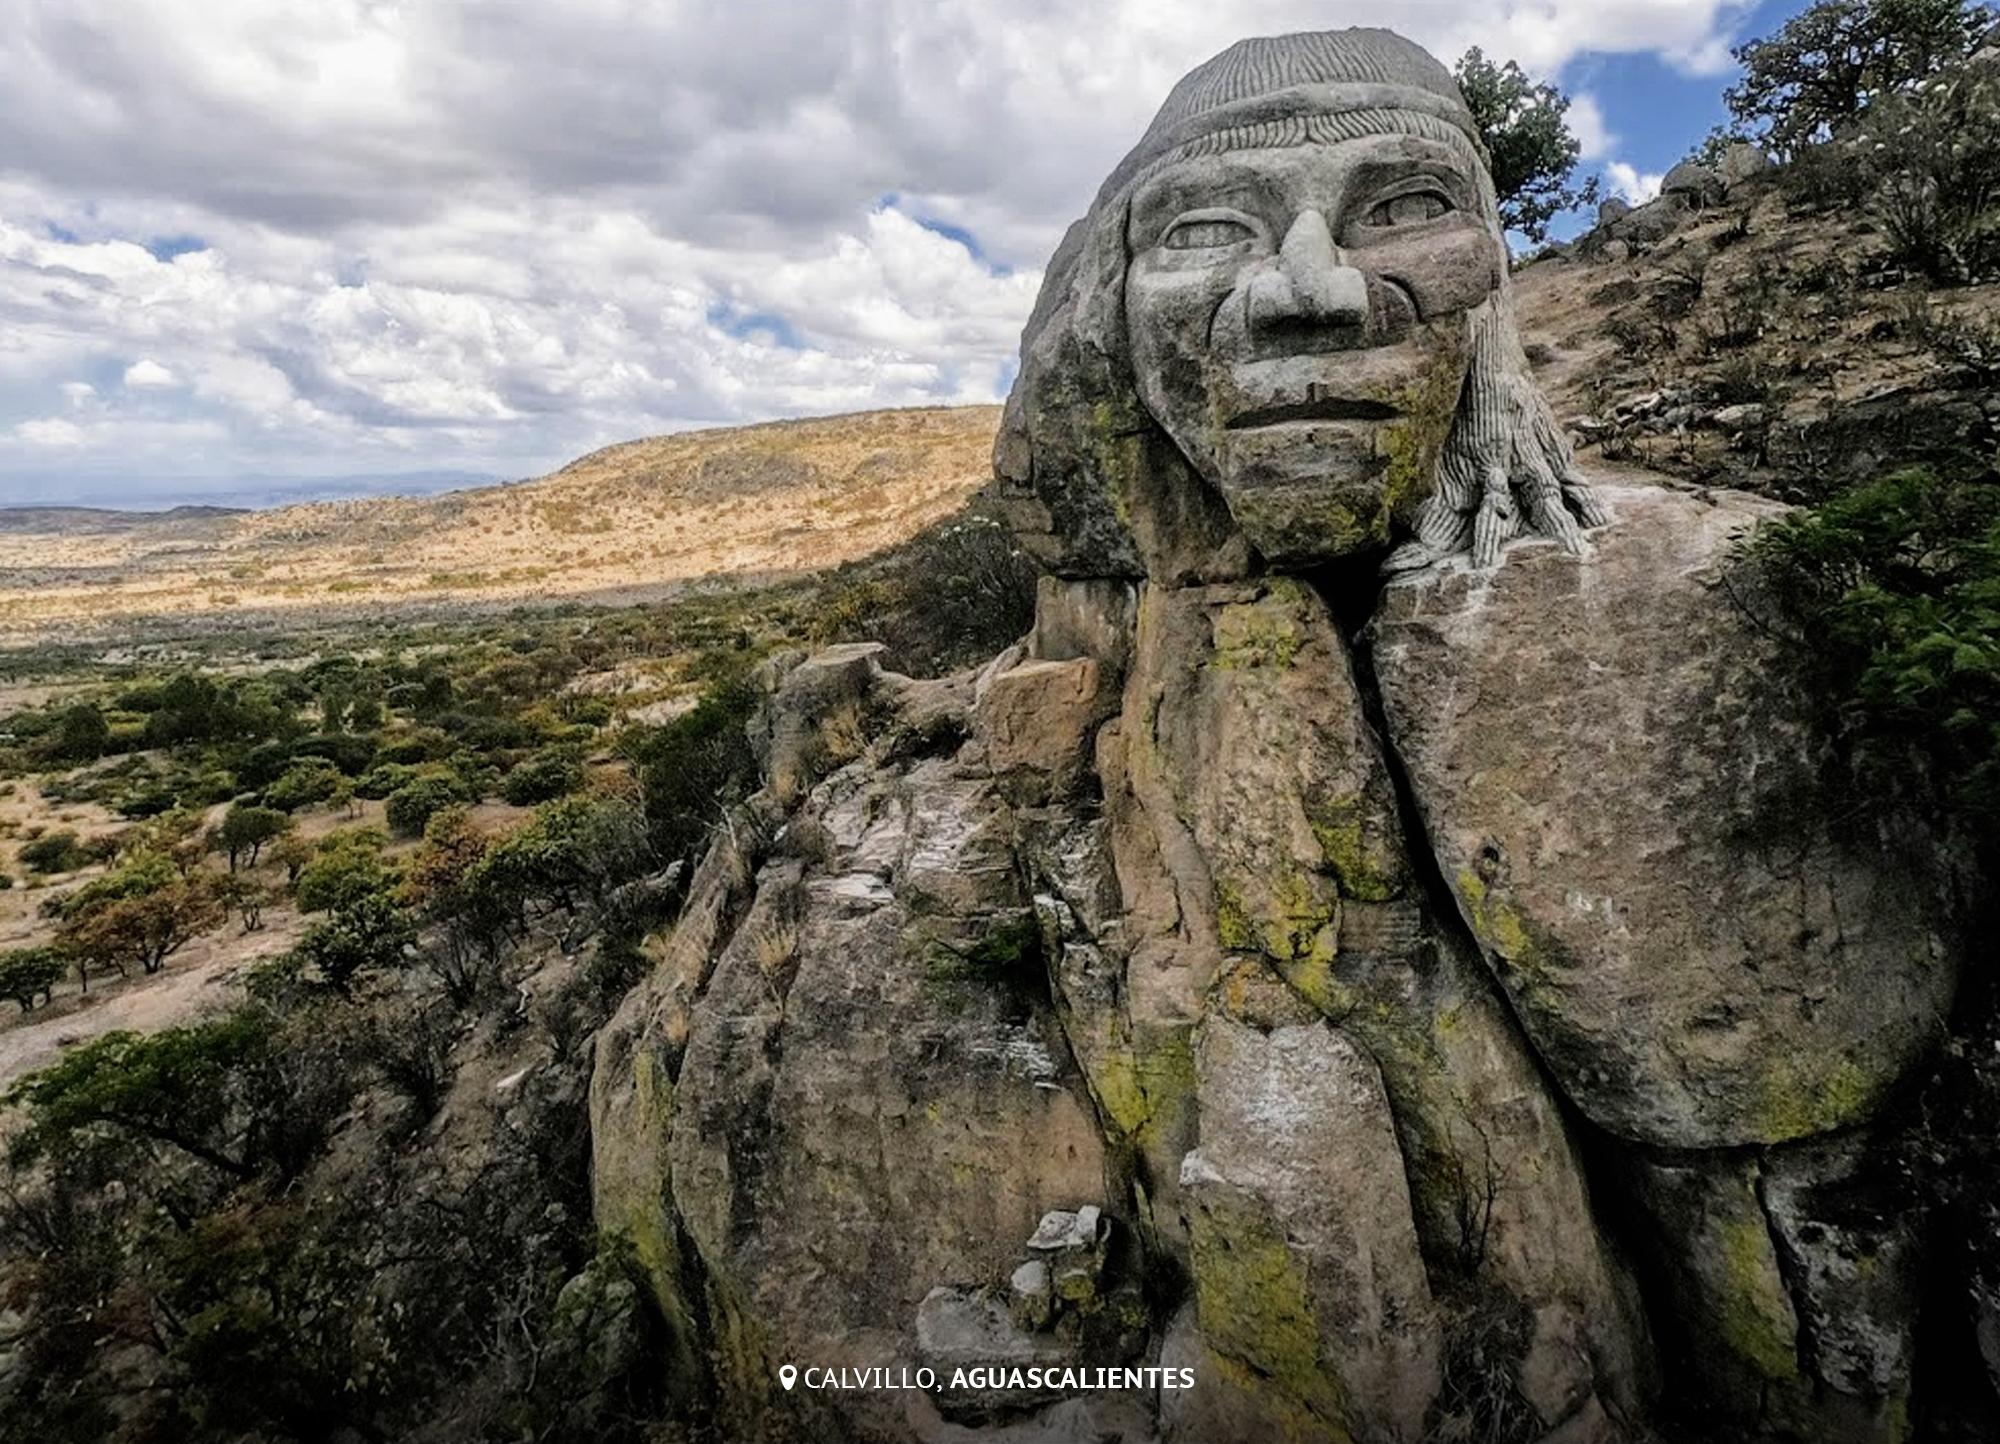 Catatan Kecil: The Great Chichimeca Head - Pe Jung Labs